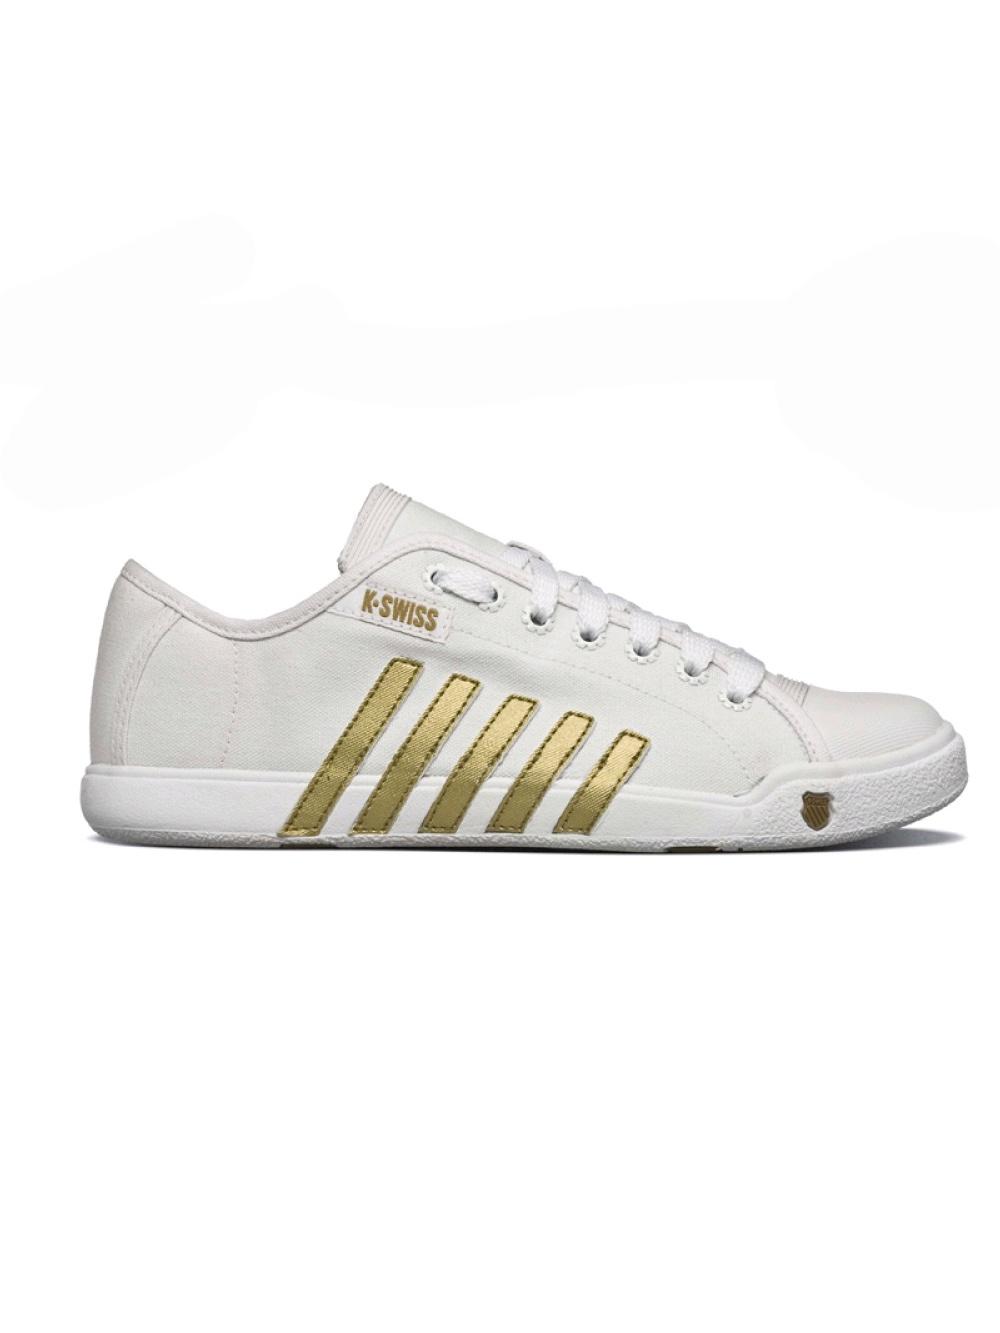 K SWISS Herren Sneaker Beste »Rinzler SP Fade« in weiß